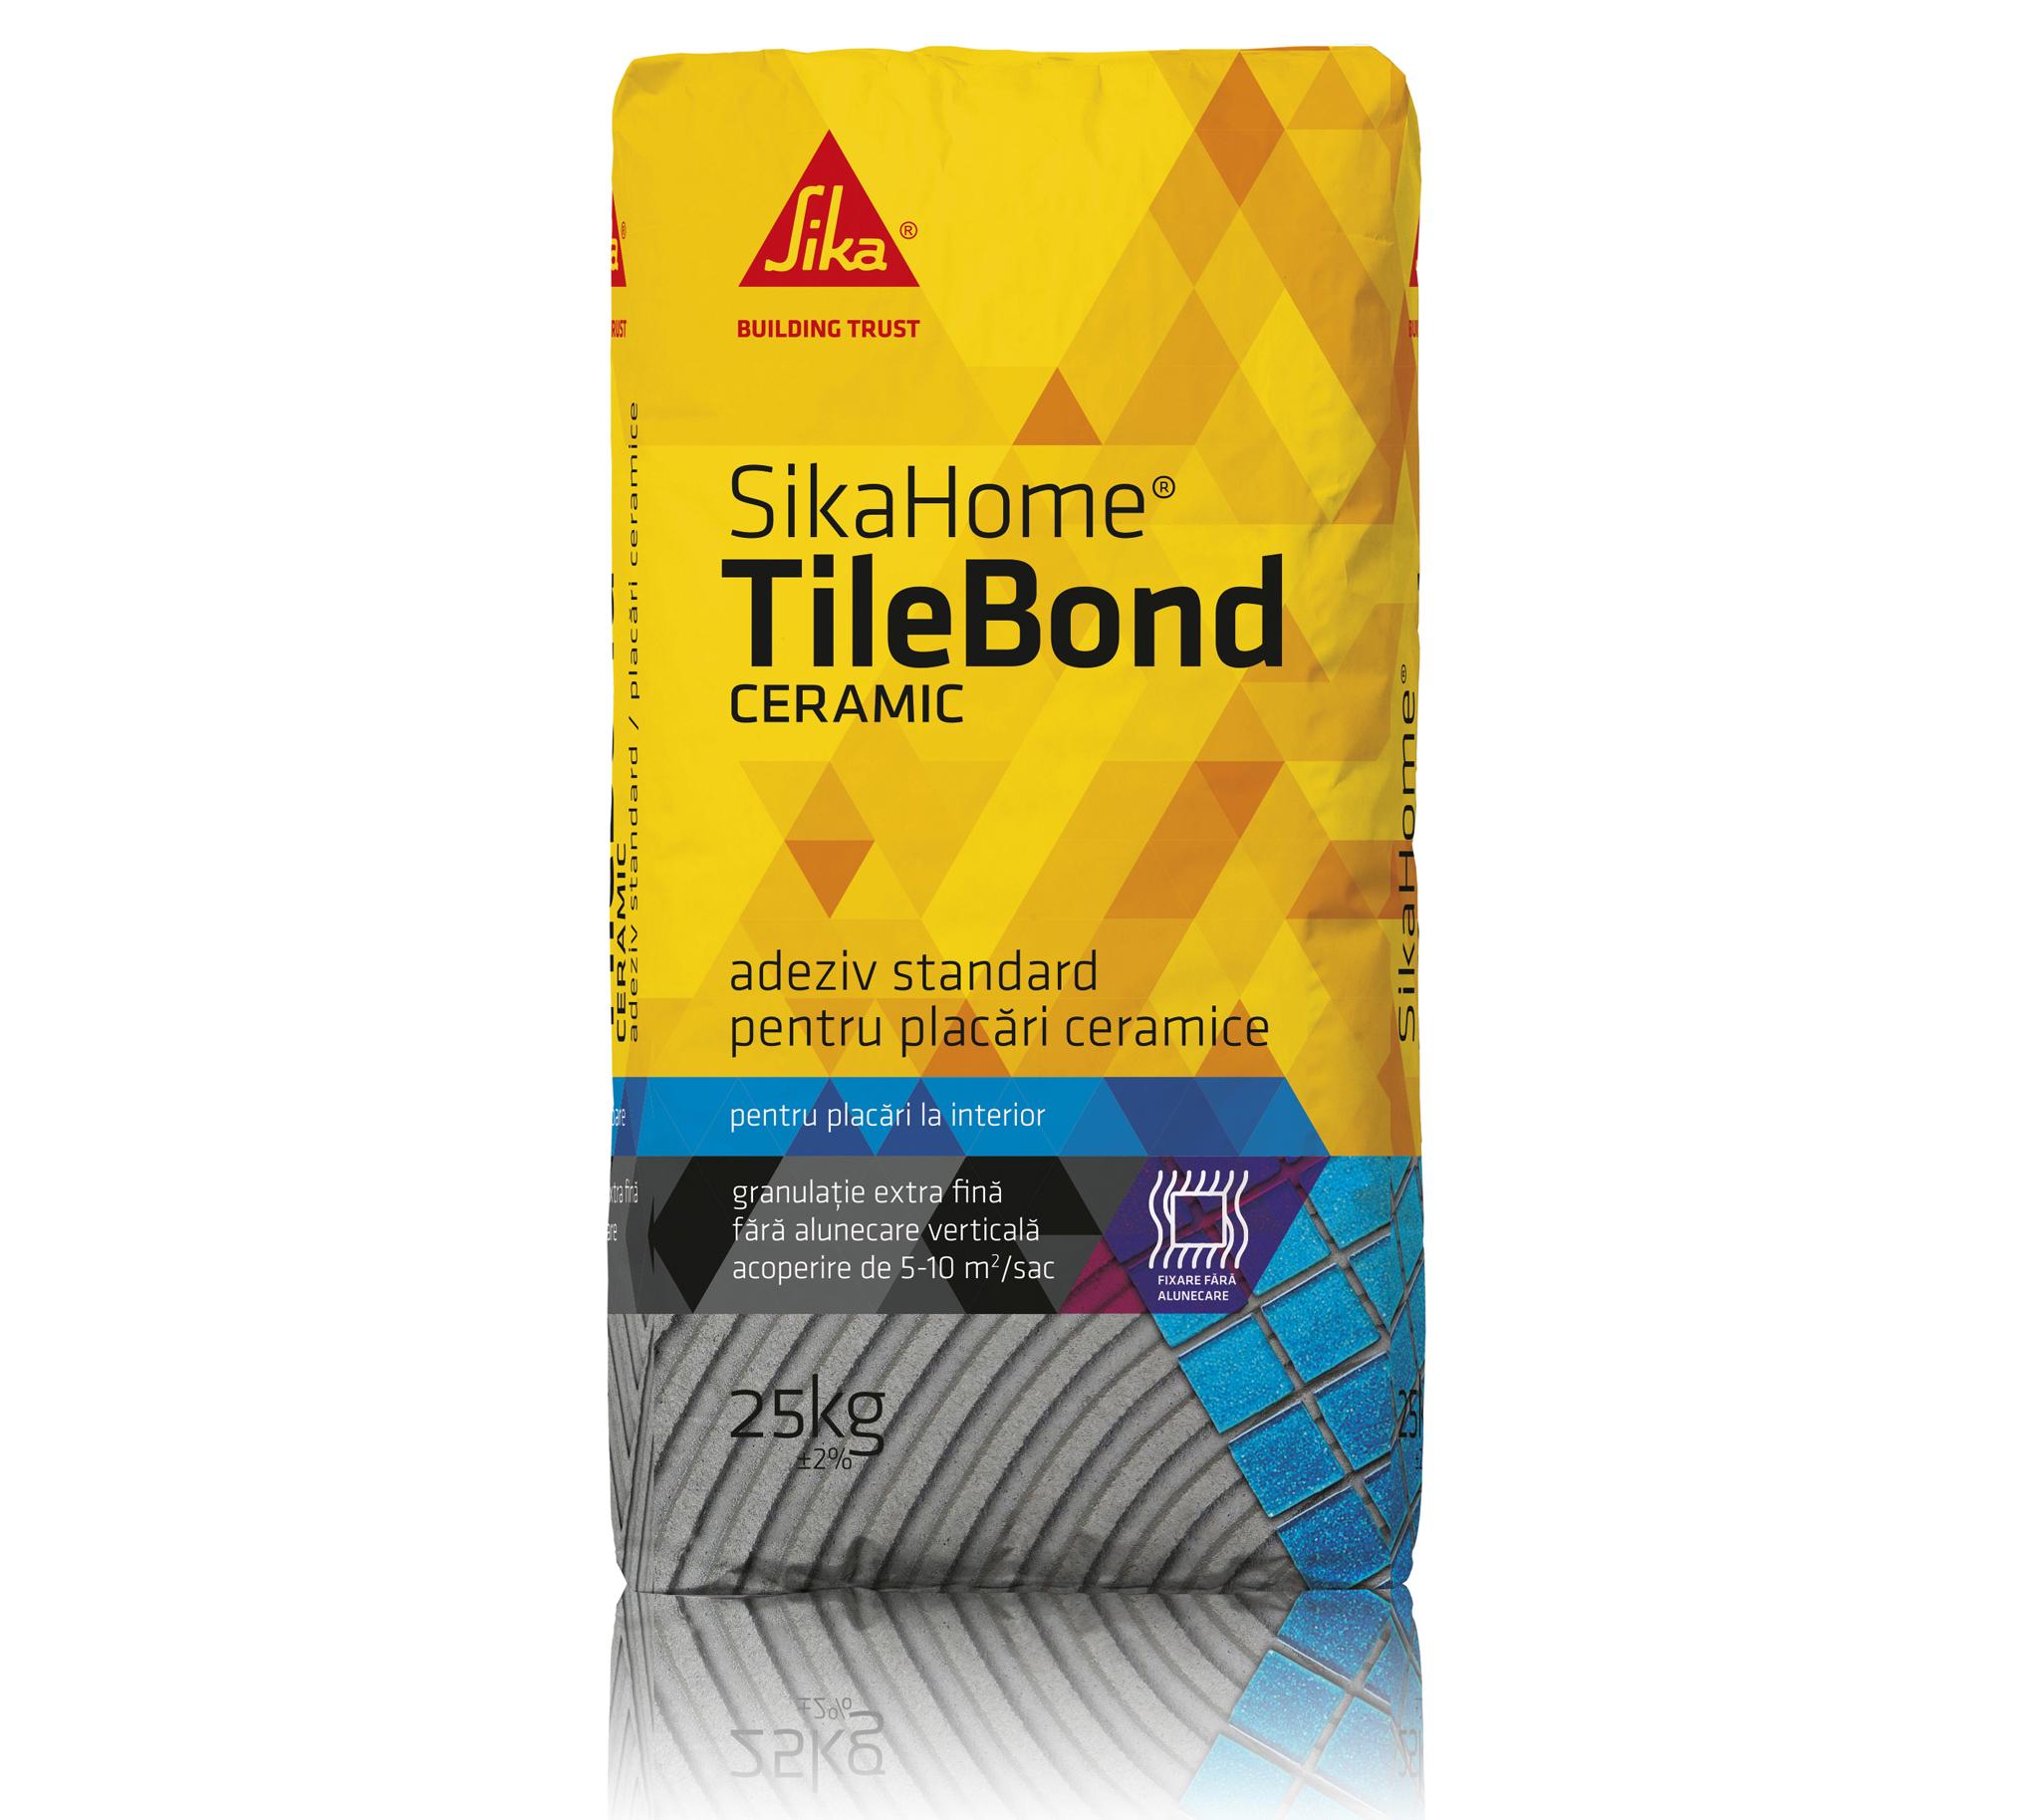 SikaHome TileBond Ceramic - SikaHome Tilebond Ceramic